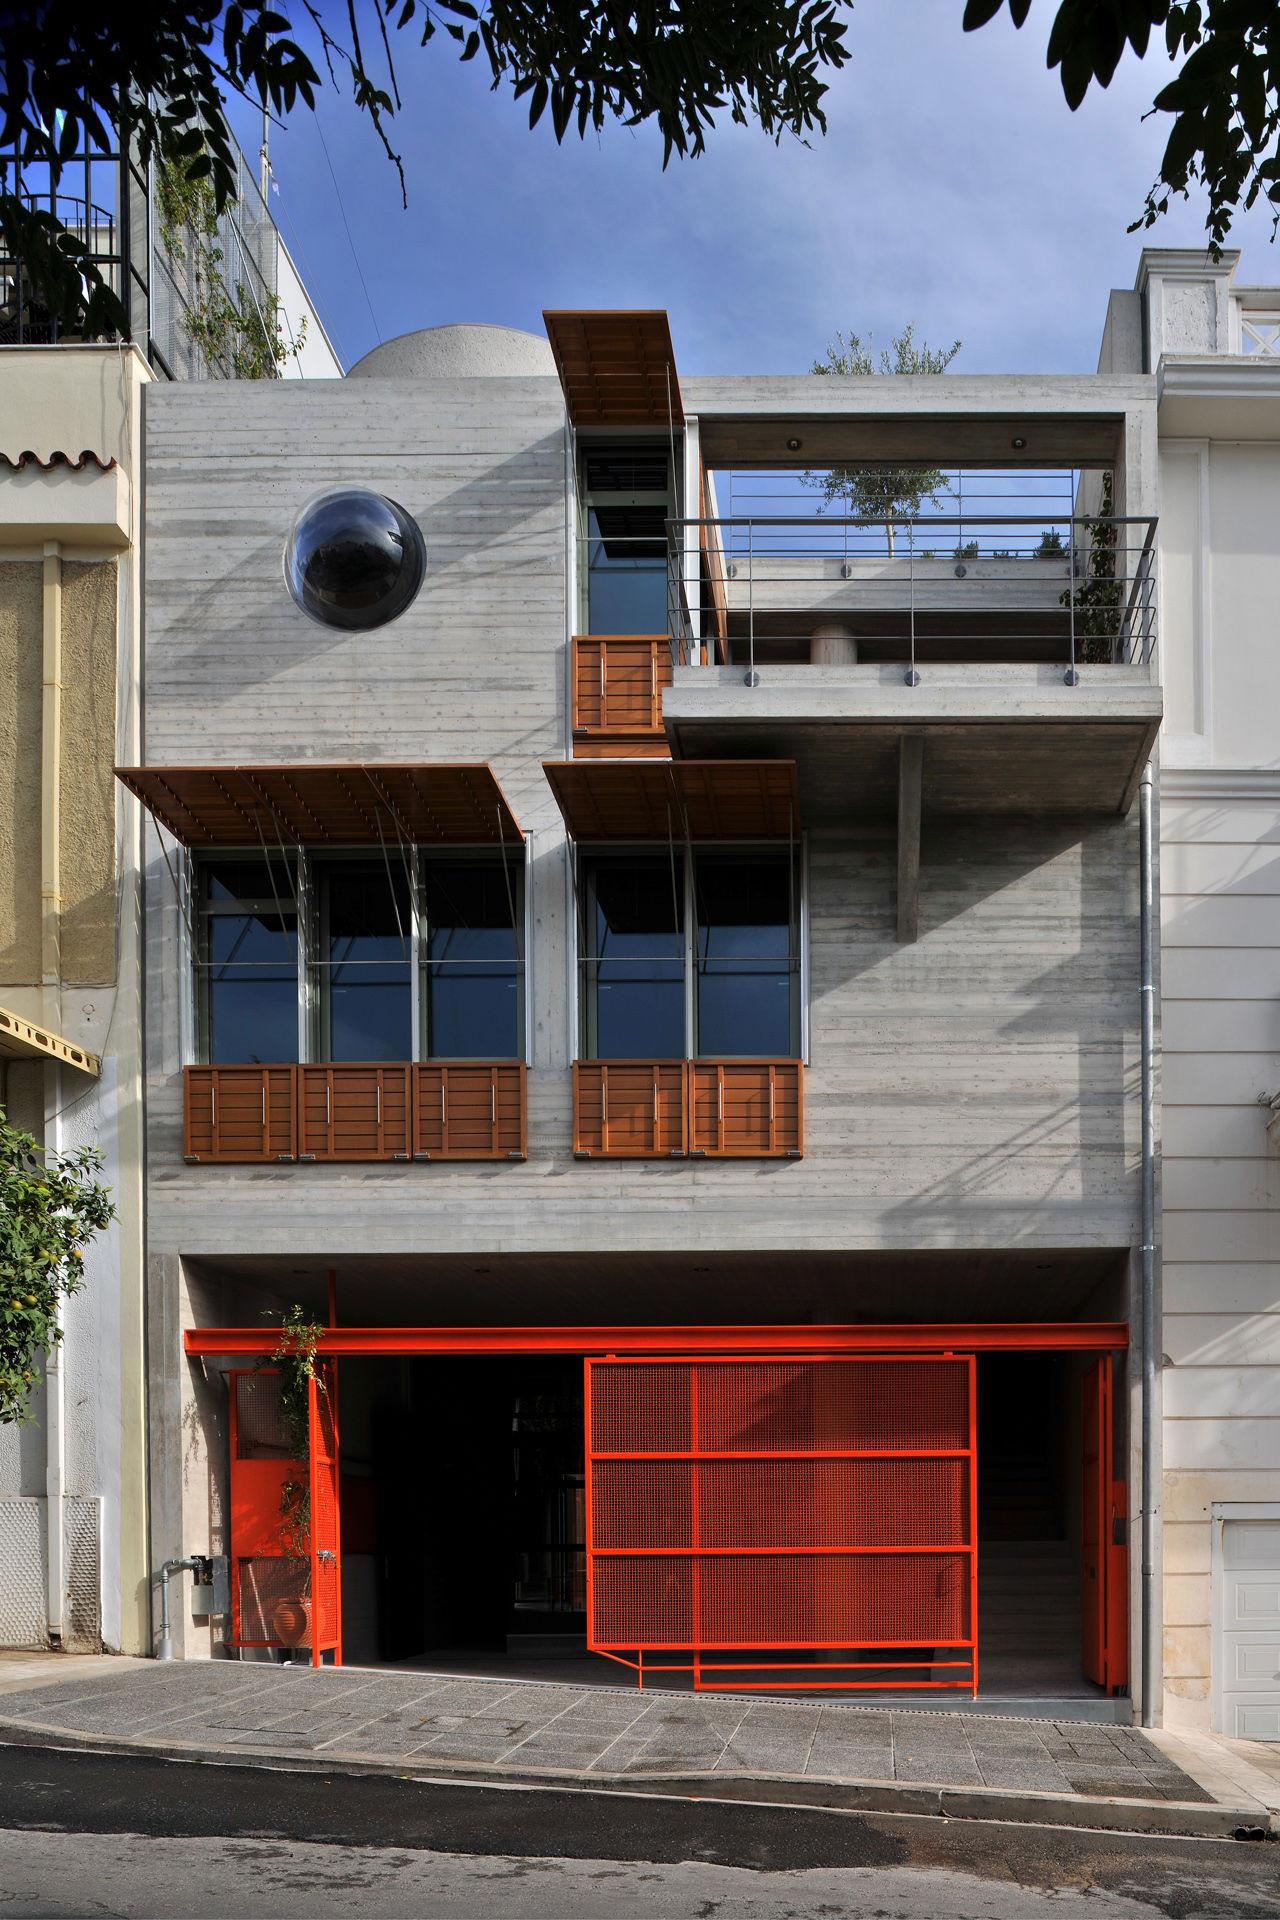 Gallery Of The House Box In Koukaki Sofia Tsiraki 1